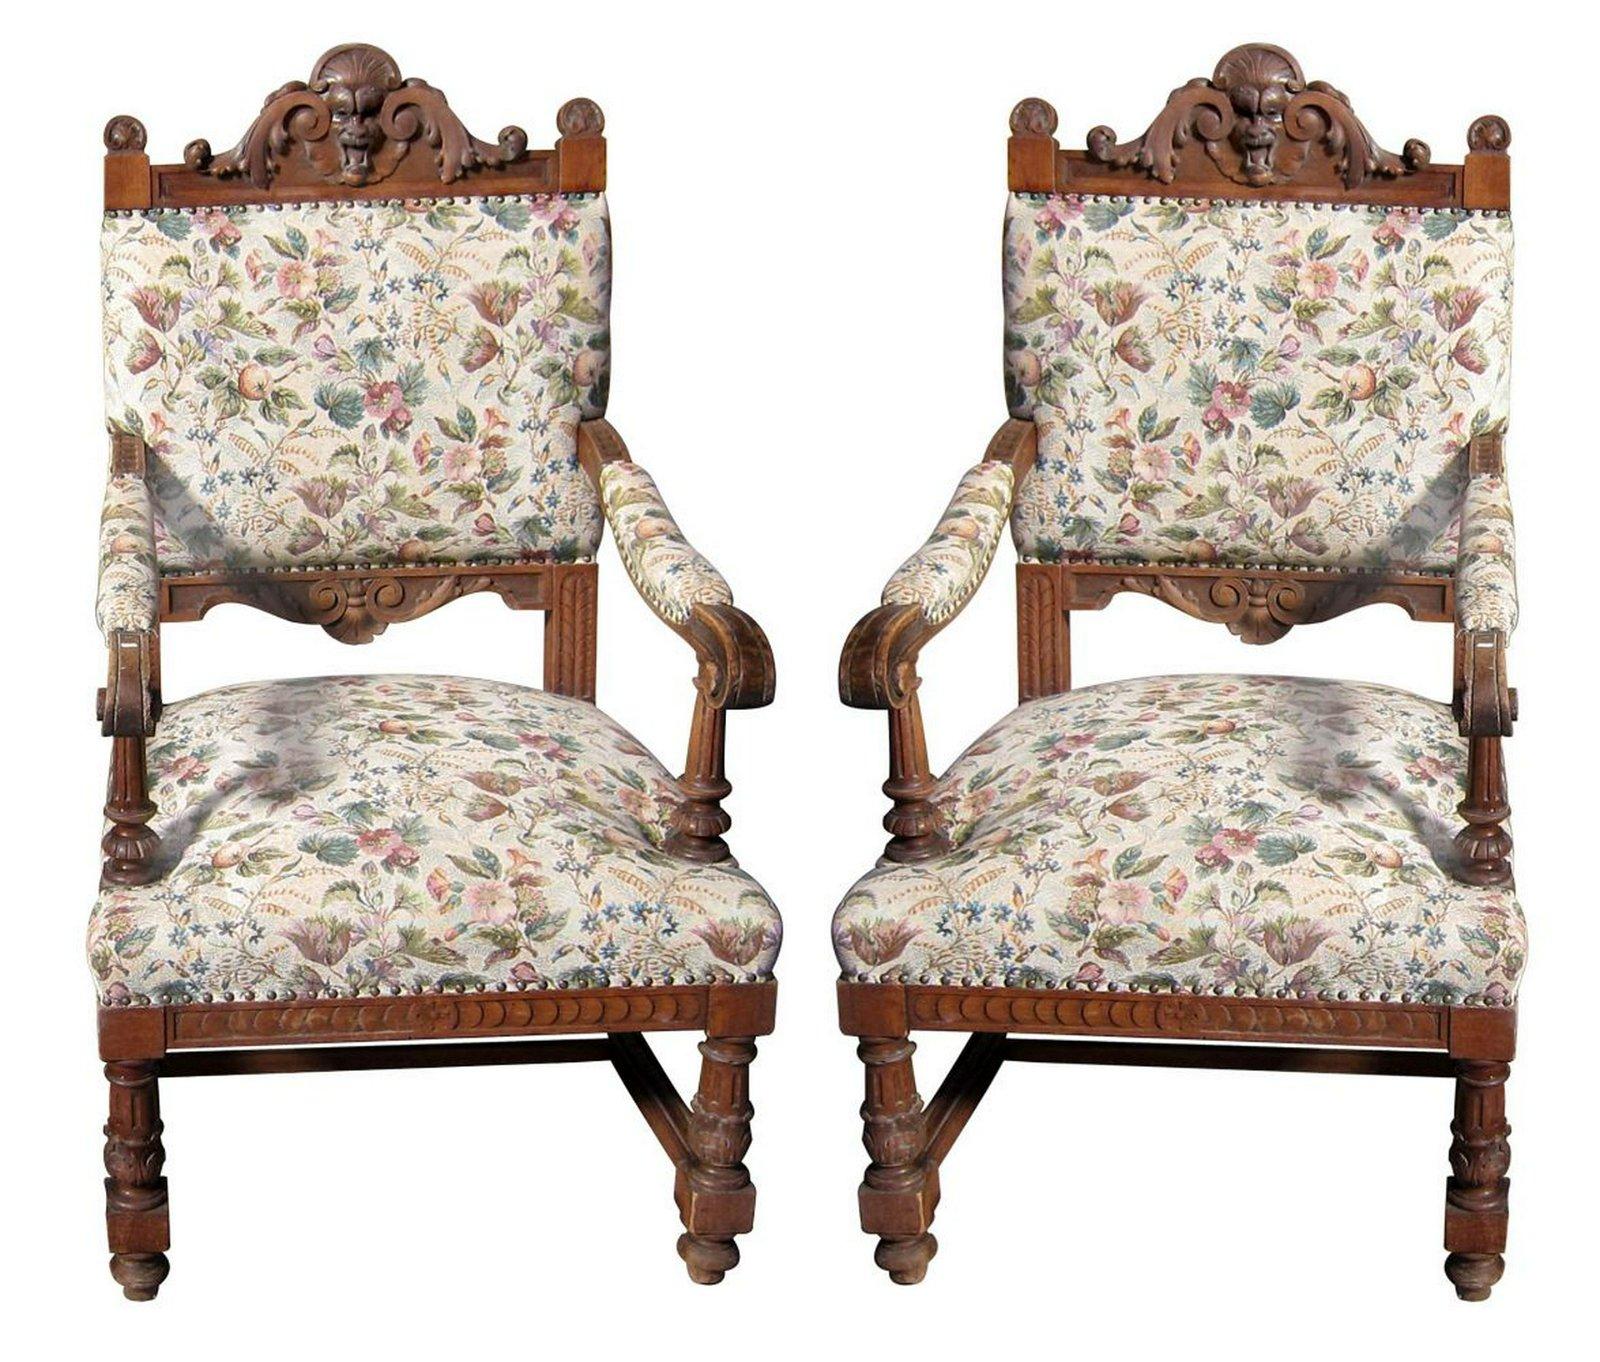 Pair of antique Henri II-style oak armchairs